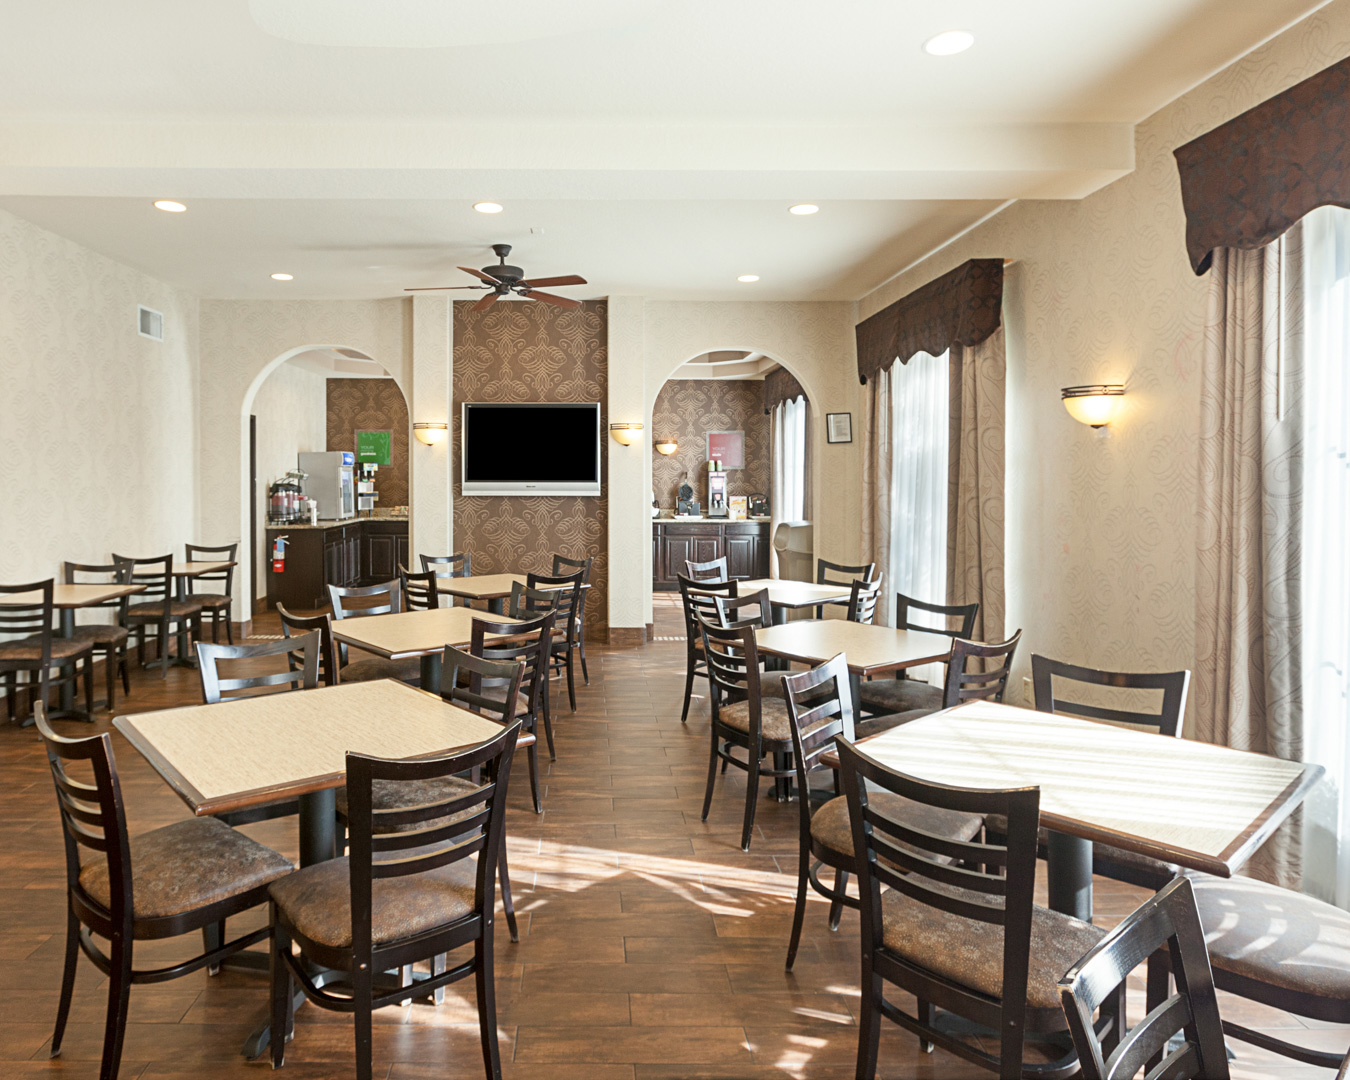 San Antonio Tx Hotels Comfort Inn Hotel Near Seaworld